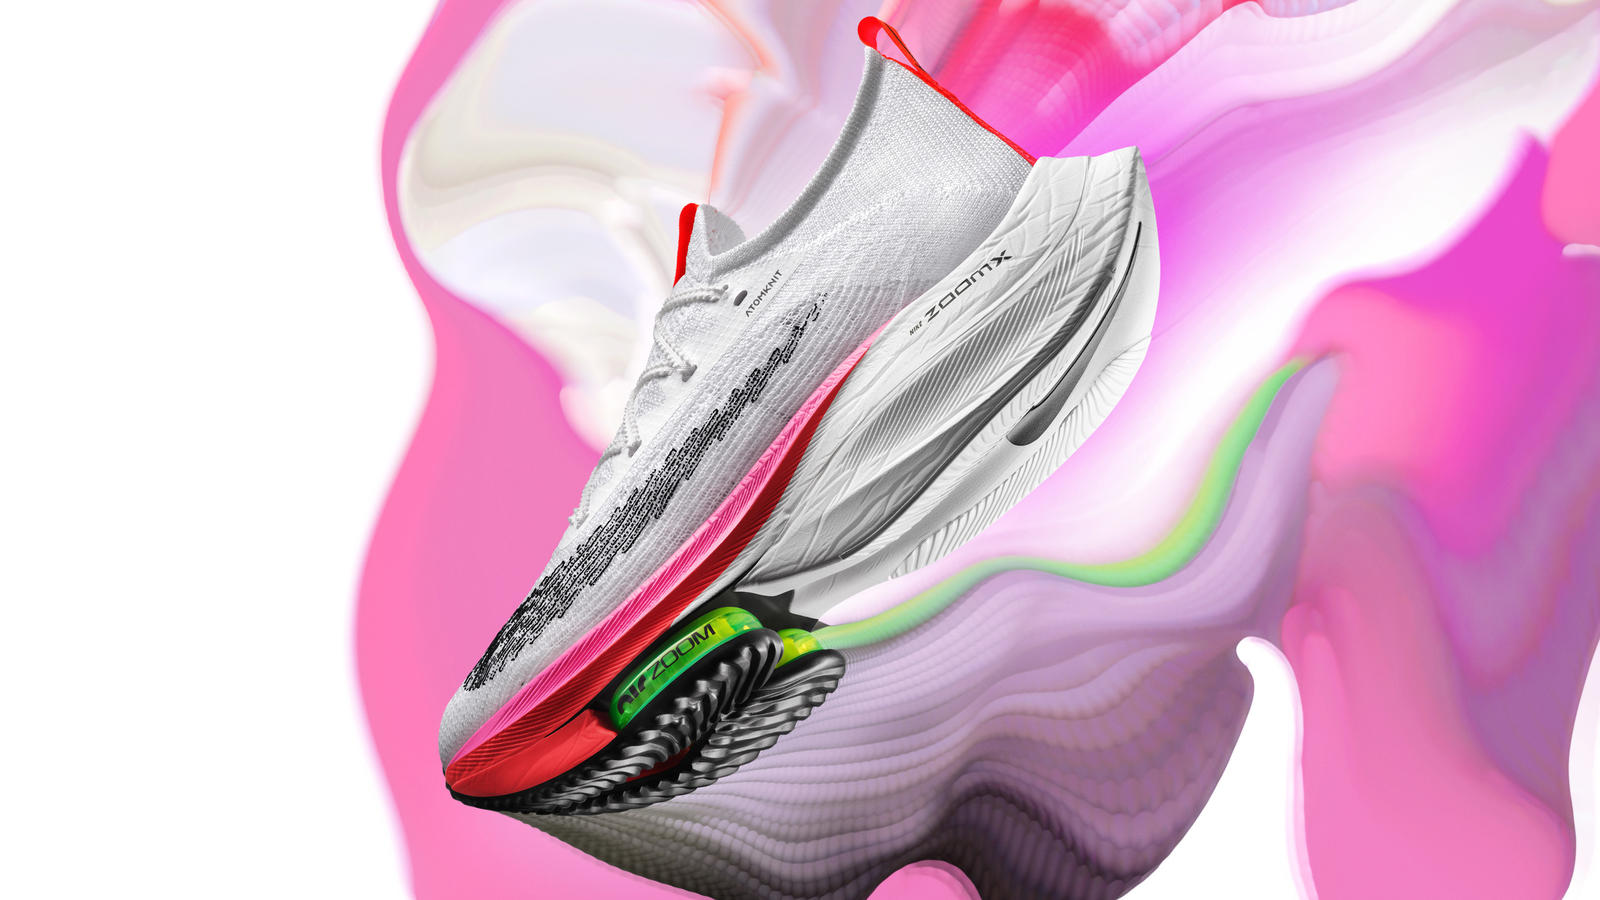 2021 Nike football boots